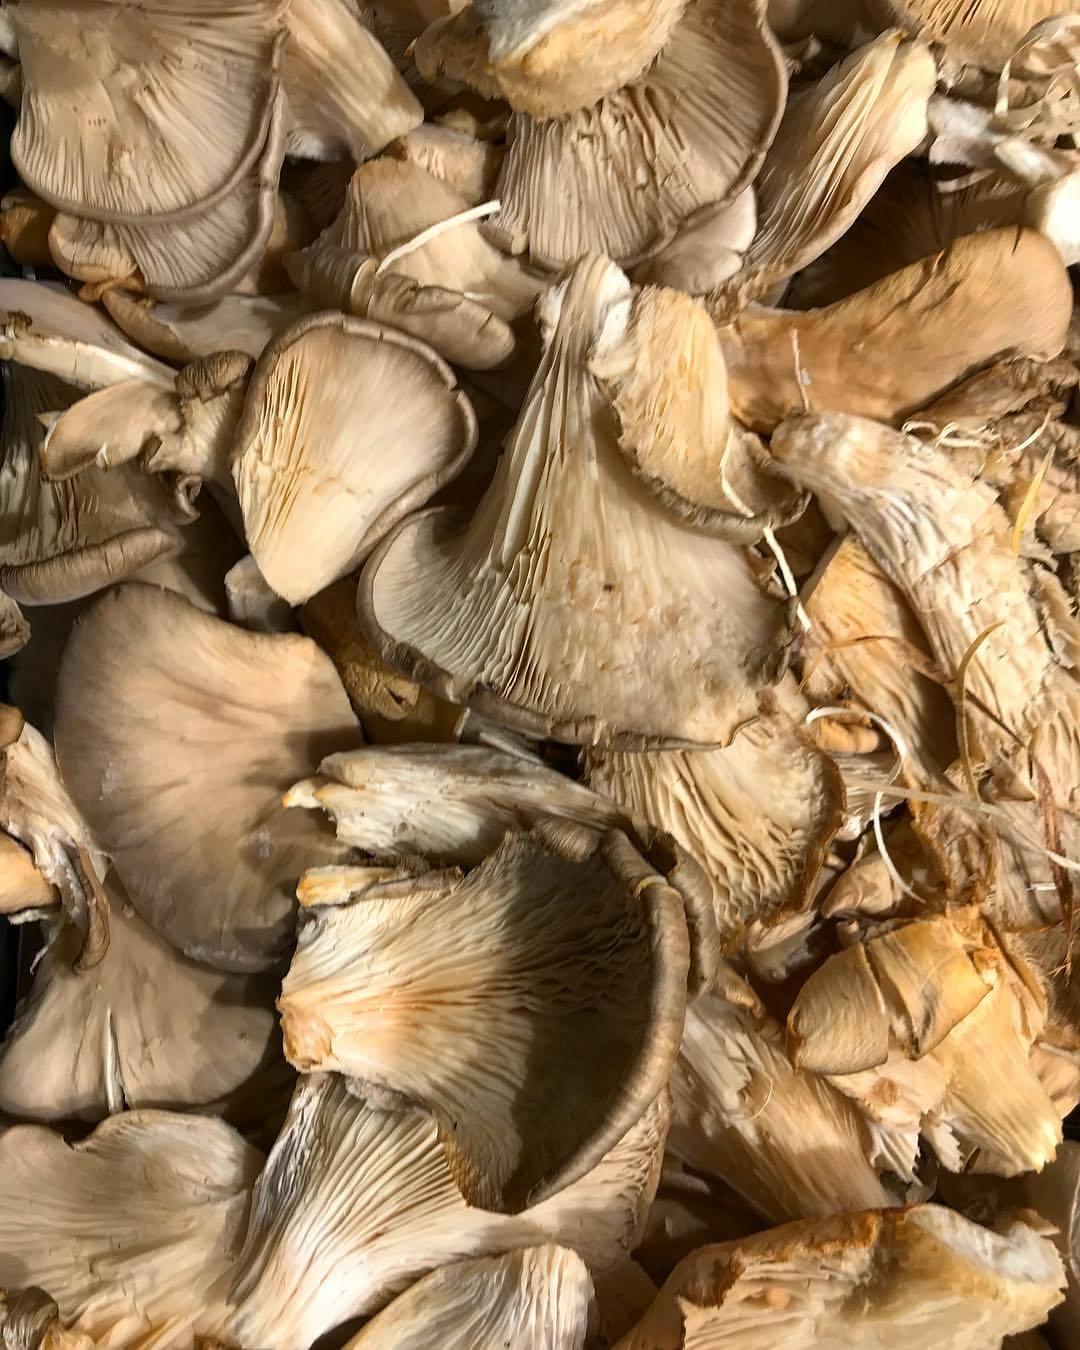 Fungi.  -  #spain #barcelona #food #tapasforbreakfast  (at Barcelona, Spain)